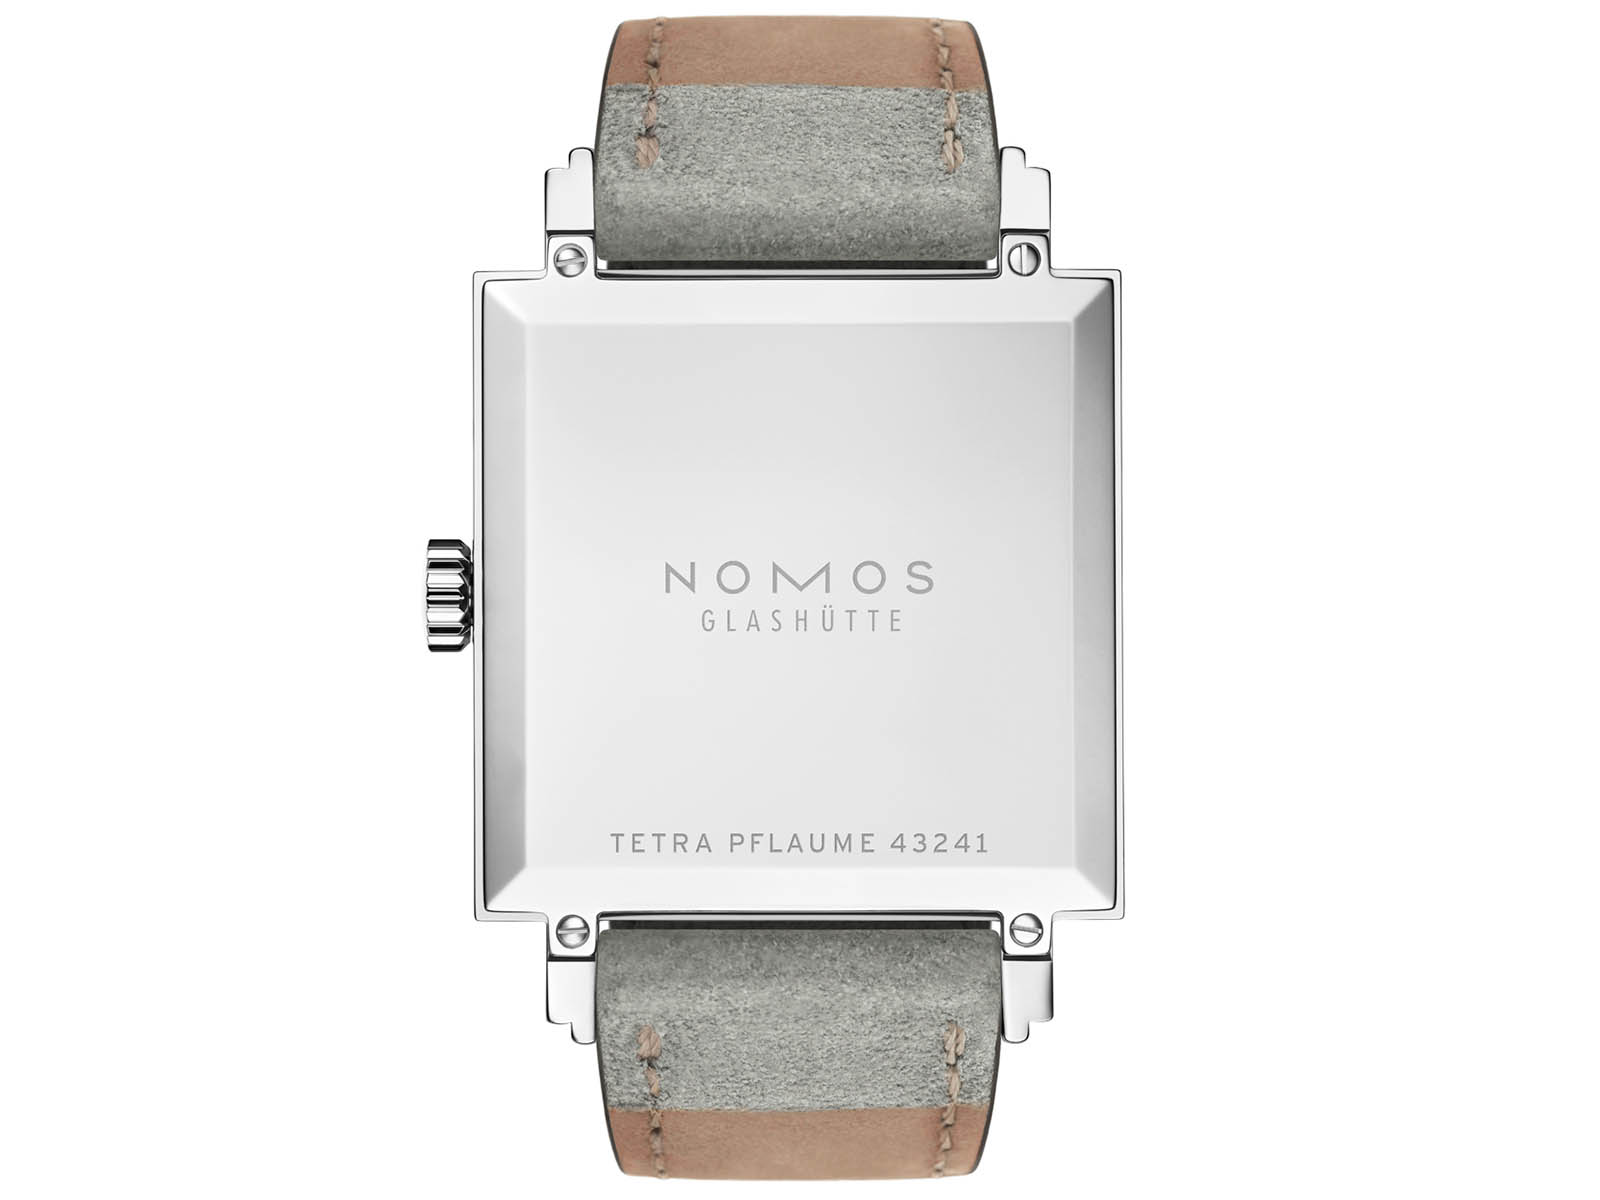 499-nomos-glashutte-tetra-plum-10.jpg